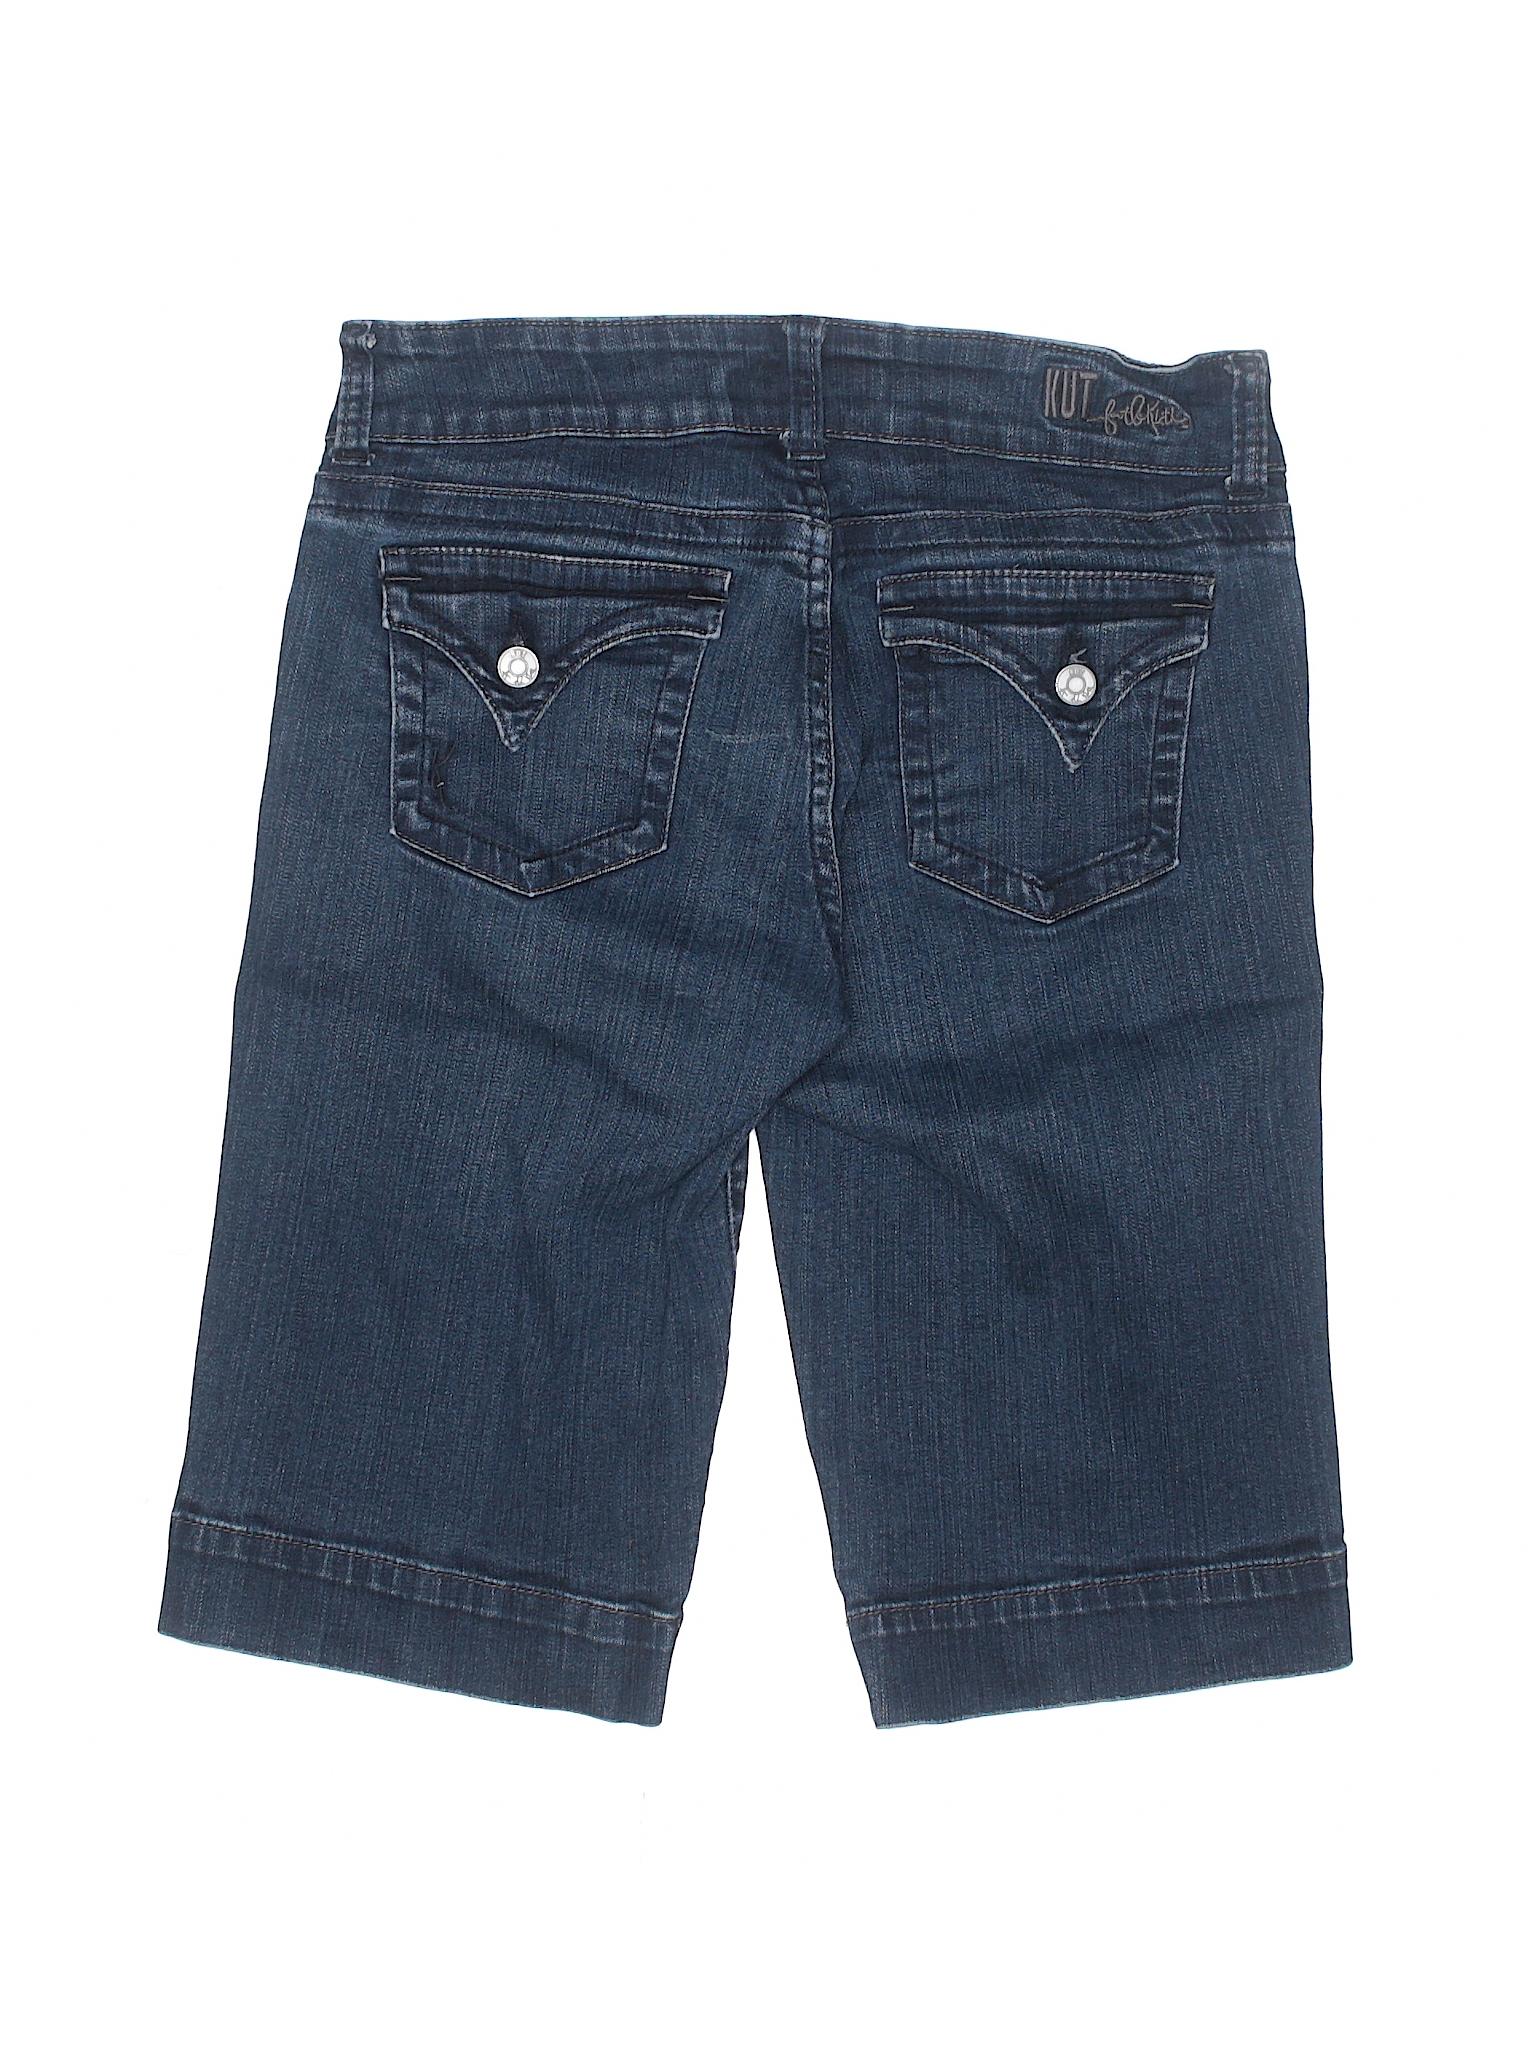 Denim Shorts Kut the from Boutique Kloth R16zpFxq